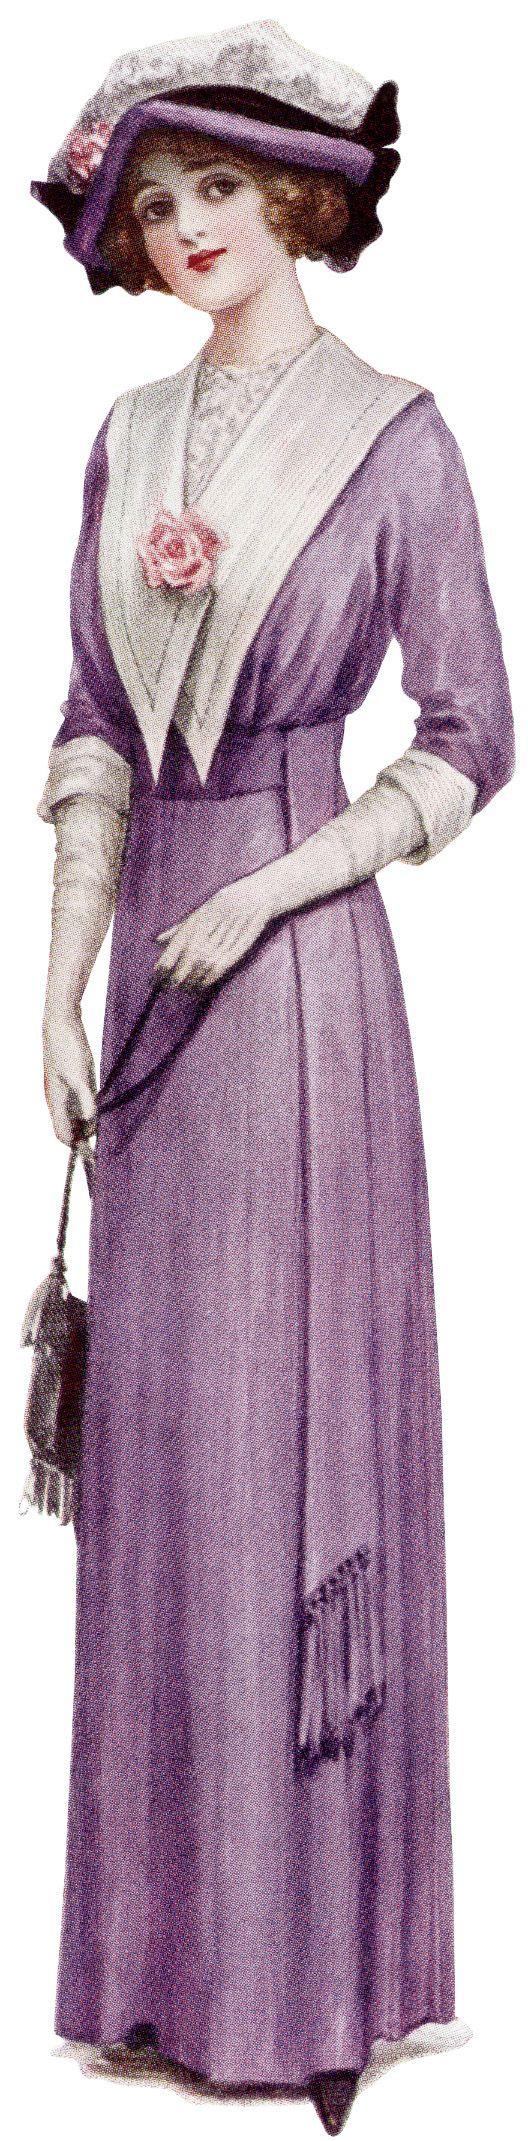 Image detail for -victorian lady, fashion 1912, vintage purple dress, antique fashion ...